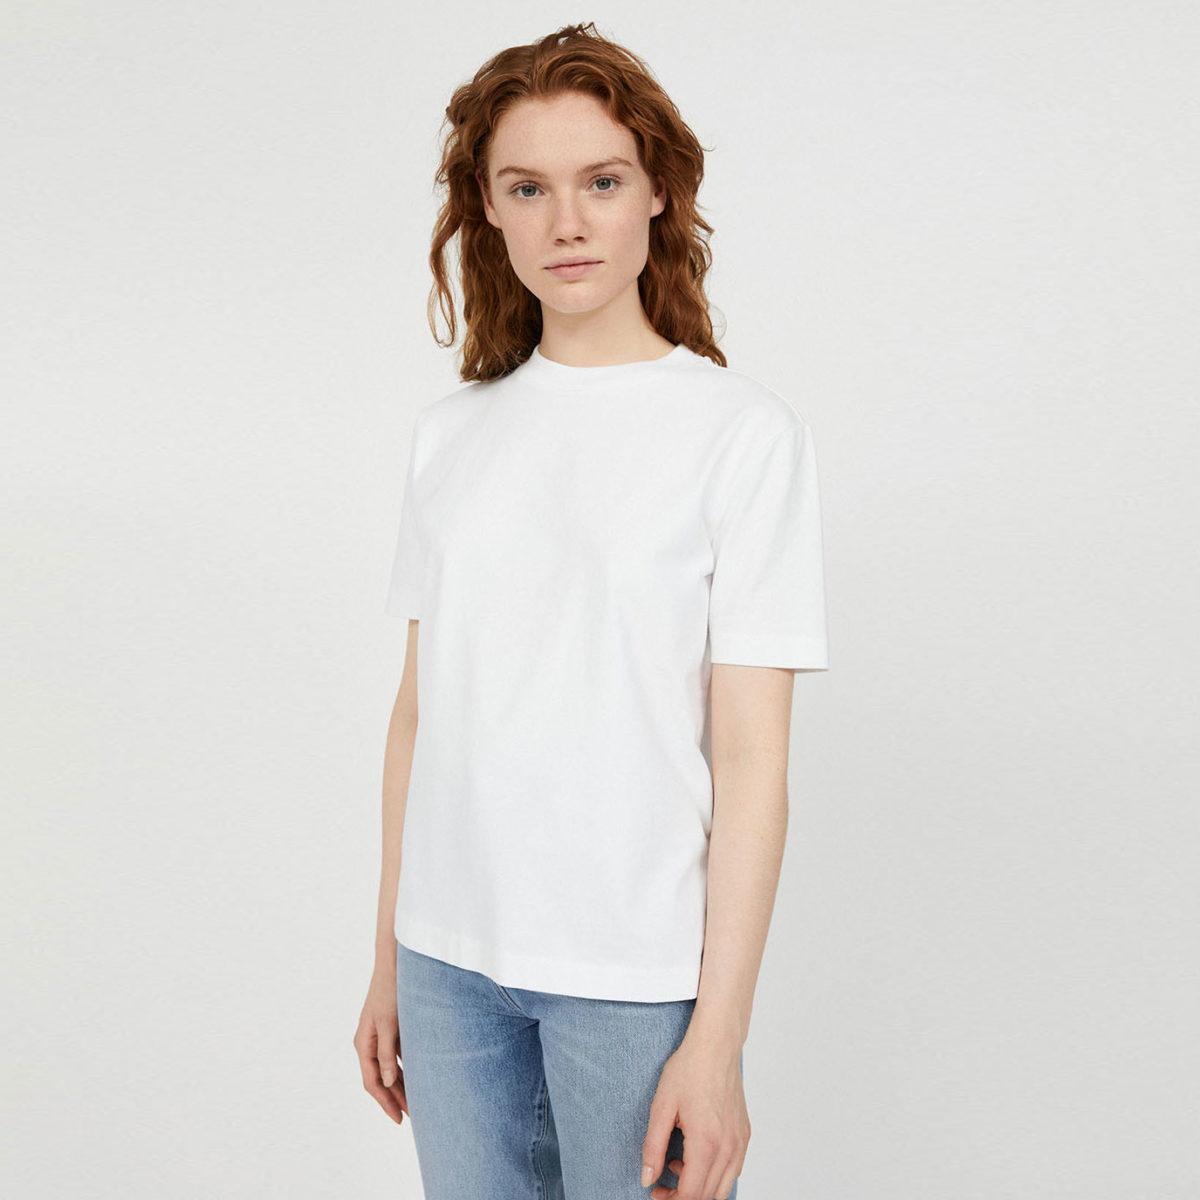 Kraftig & rejäl ekologisk t-shirt